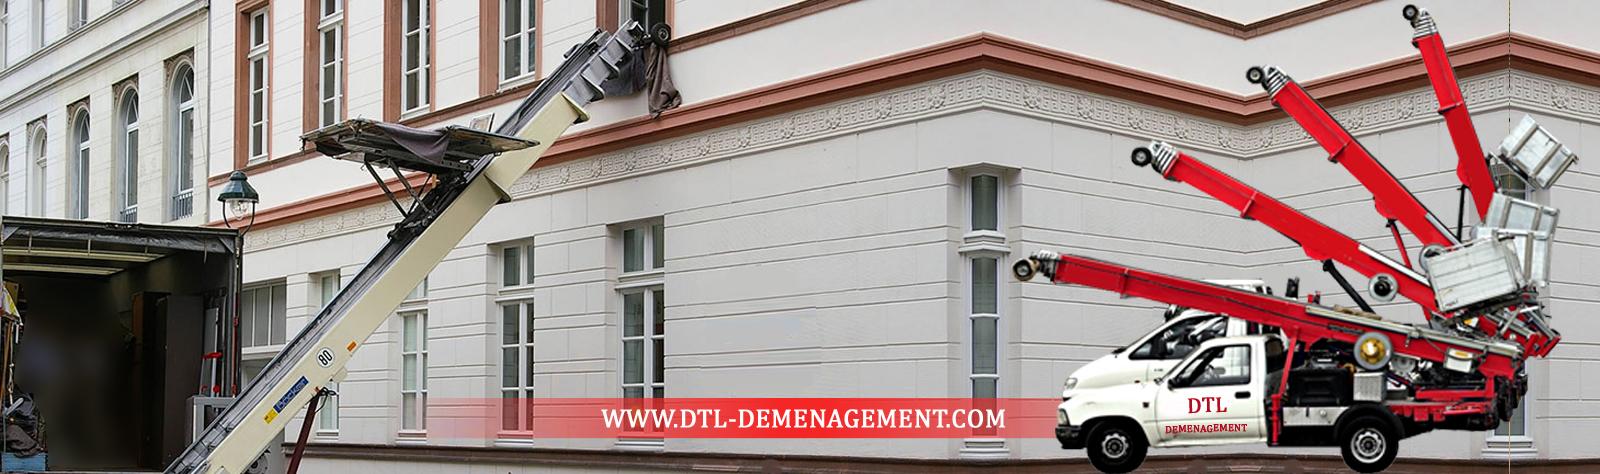 Dtl-demenagement - Monte Meuble